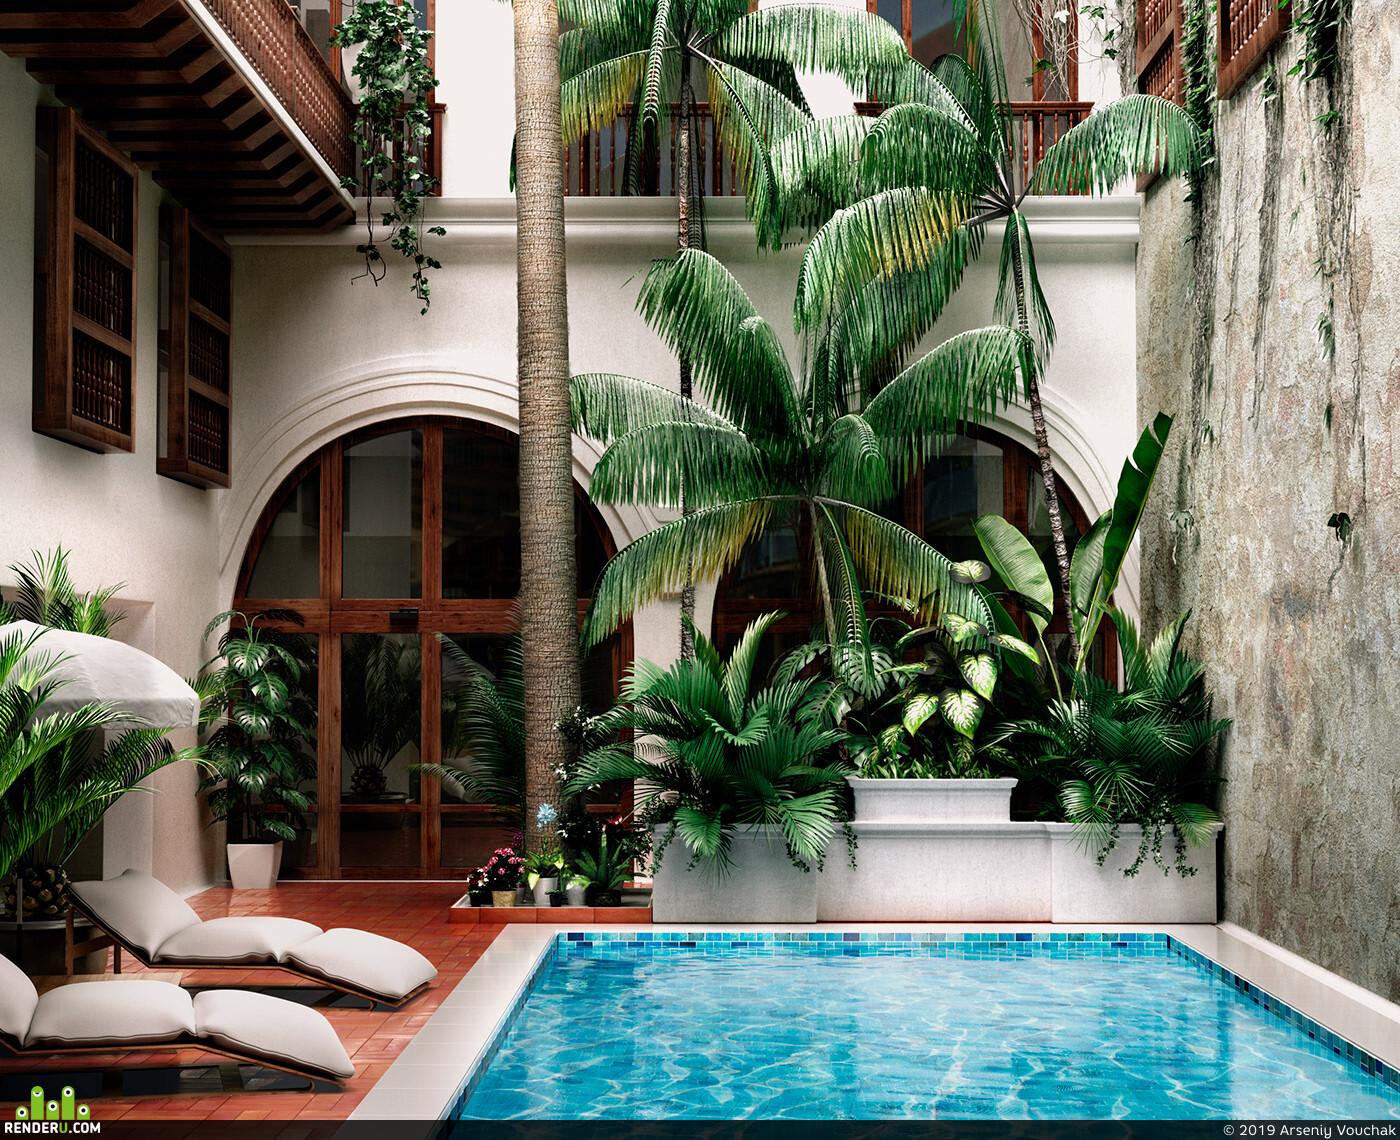 3d, visualization, render, art, interior, Exterior, Nature, pool, corona, realistic